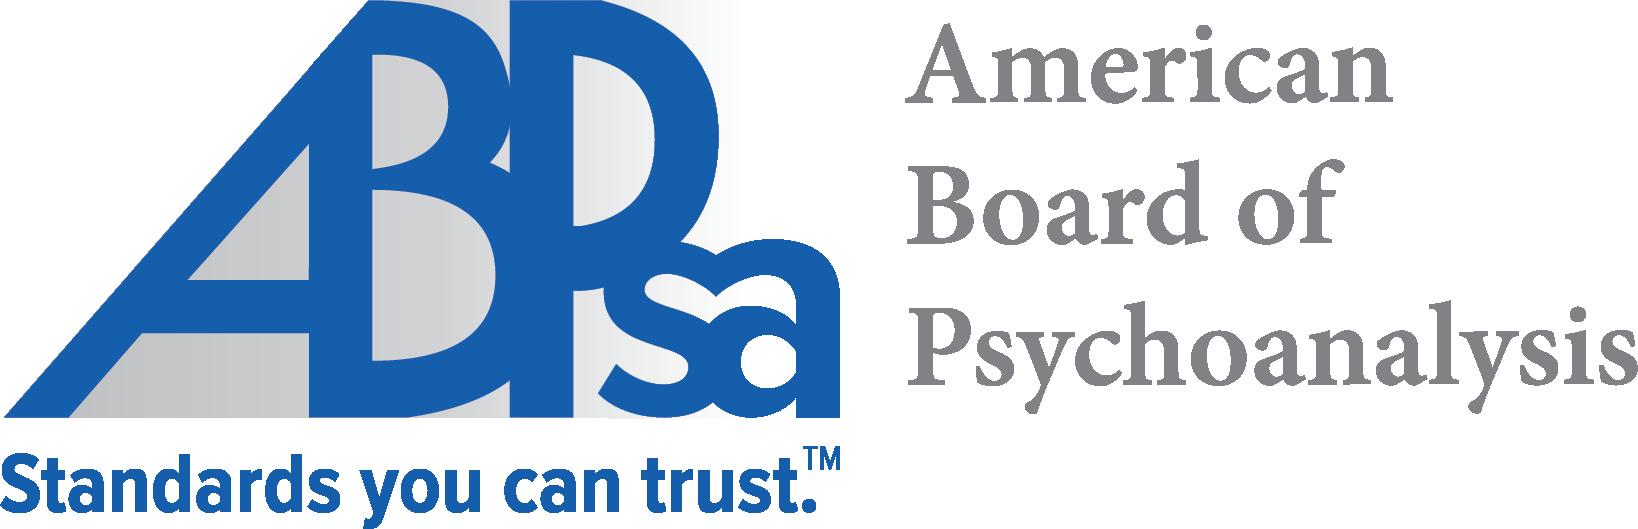 American Board Of Psychoanalysis Certification